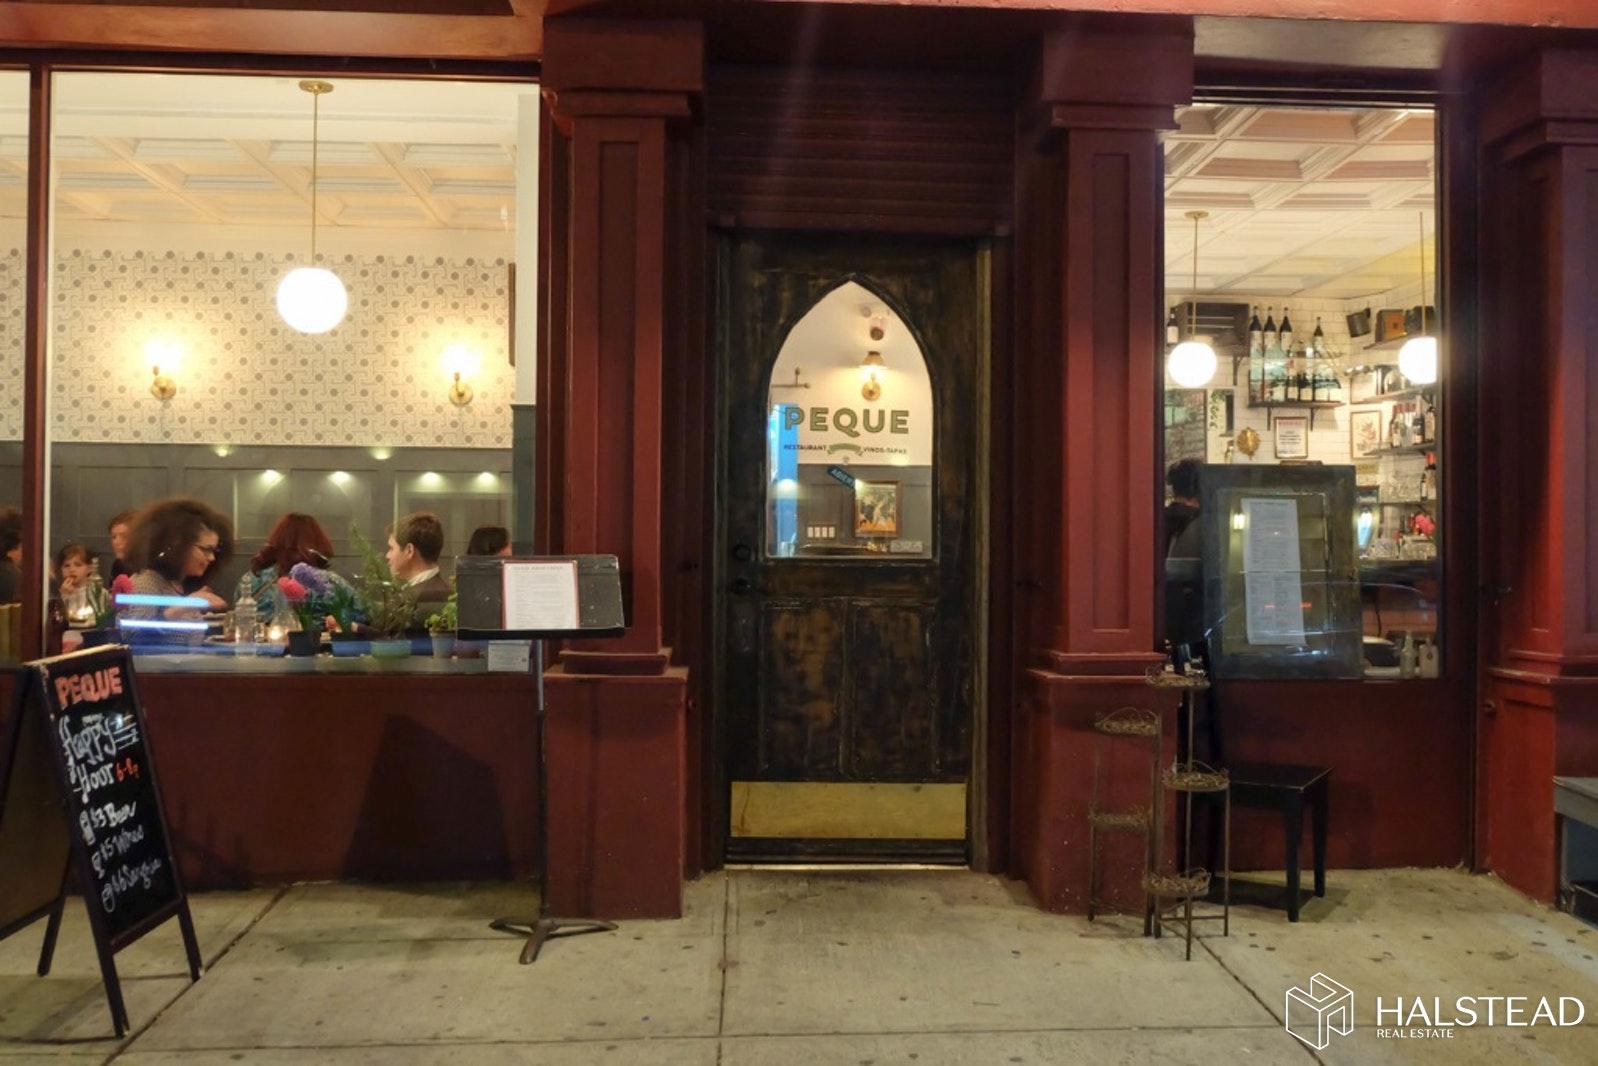 231 WEST 145TH STREET, Central Harlem, $175,000, Web #: 19699061